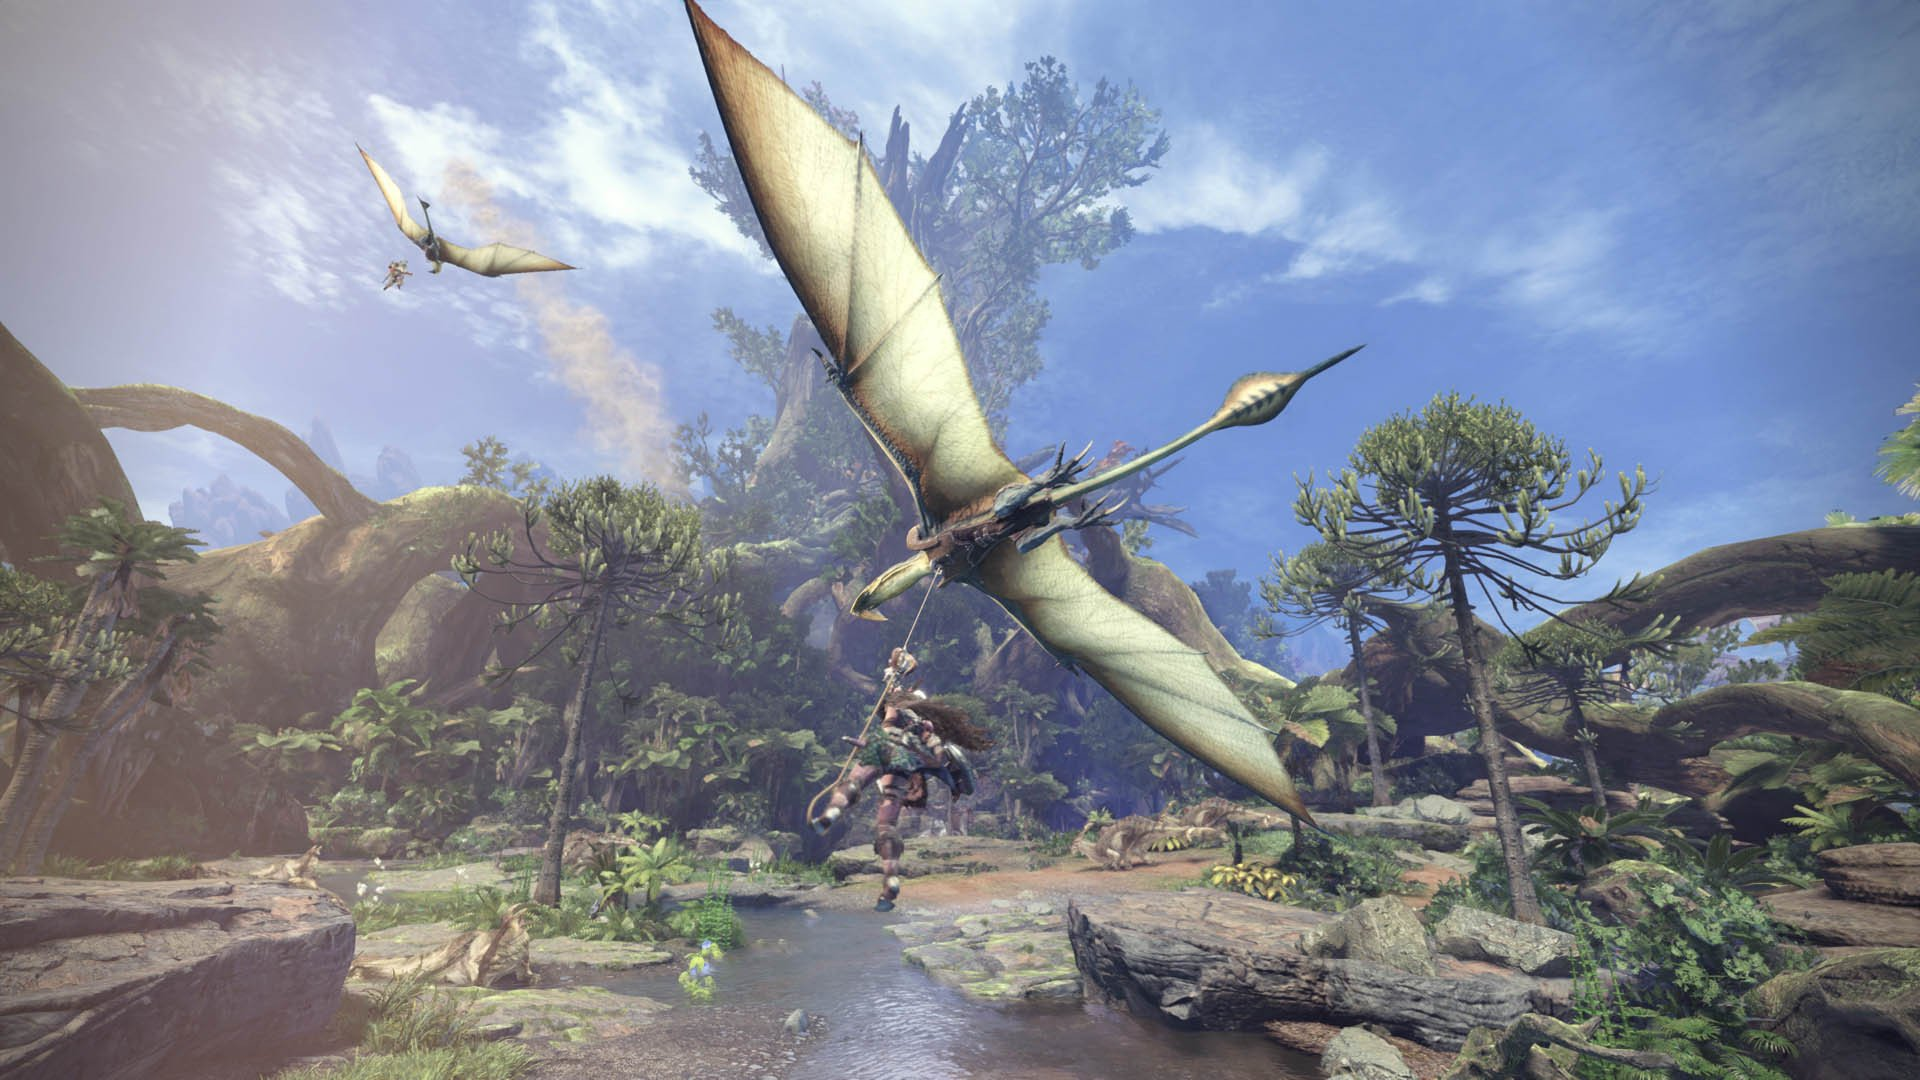 de243ee1a0 Στις 9 Αυγούστου η κυκλοφορία του Monster Hunter  World σε PC ...